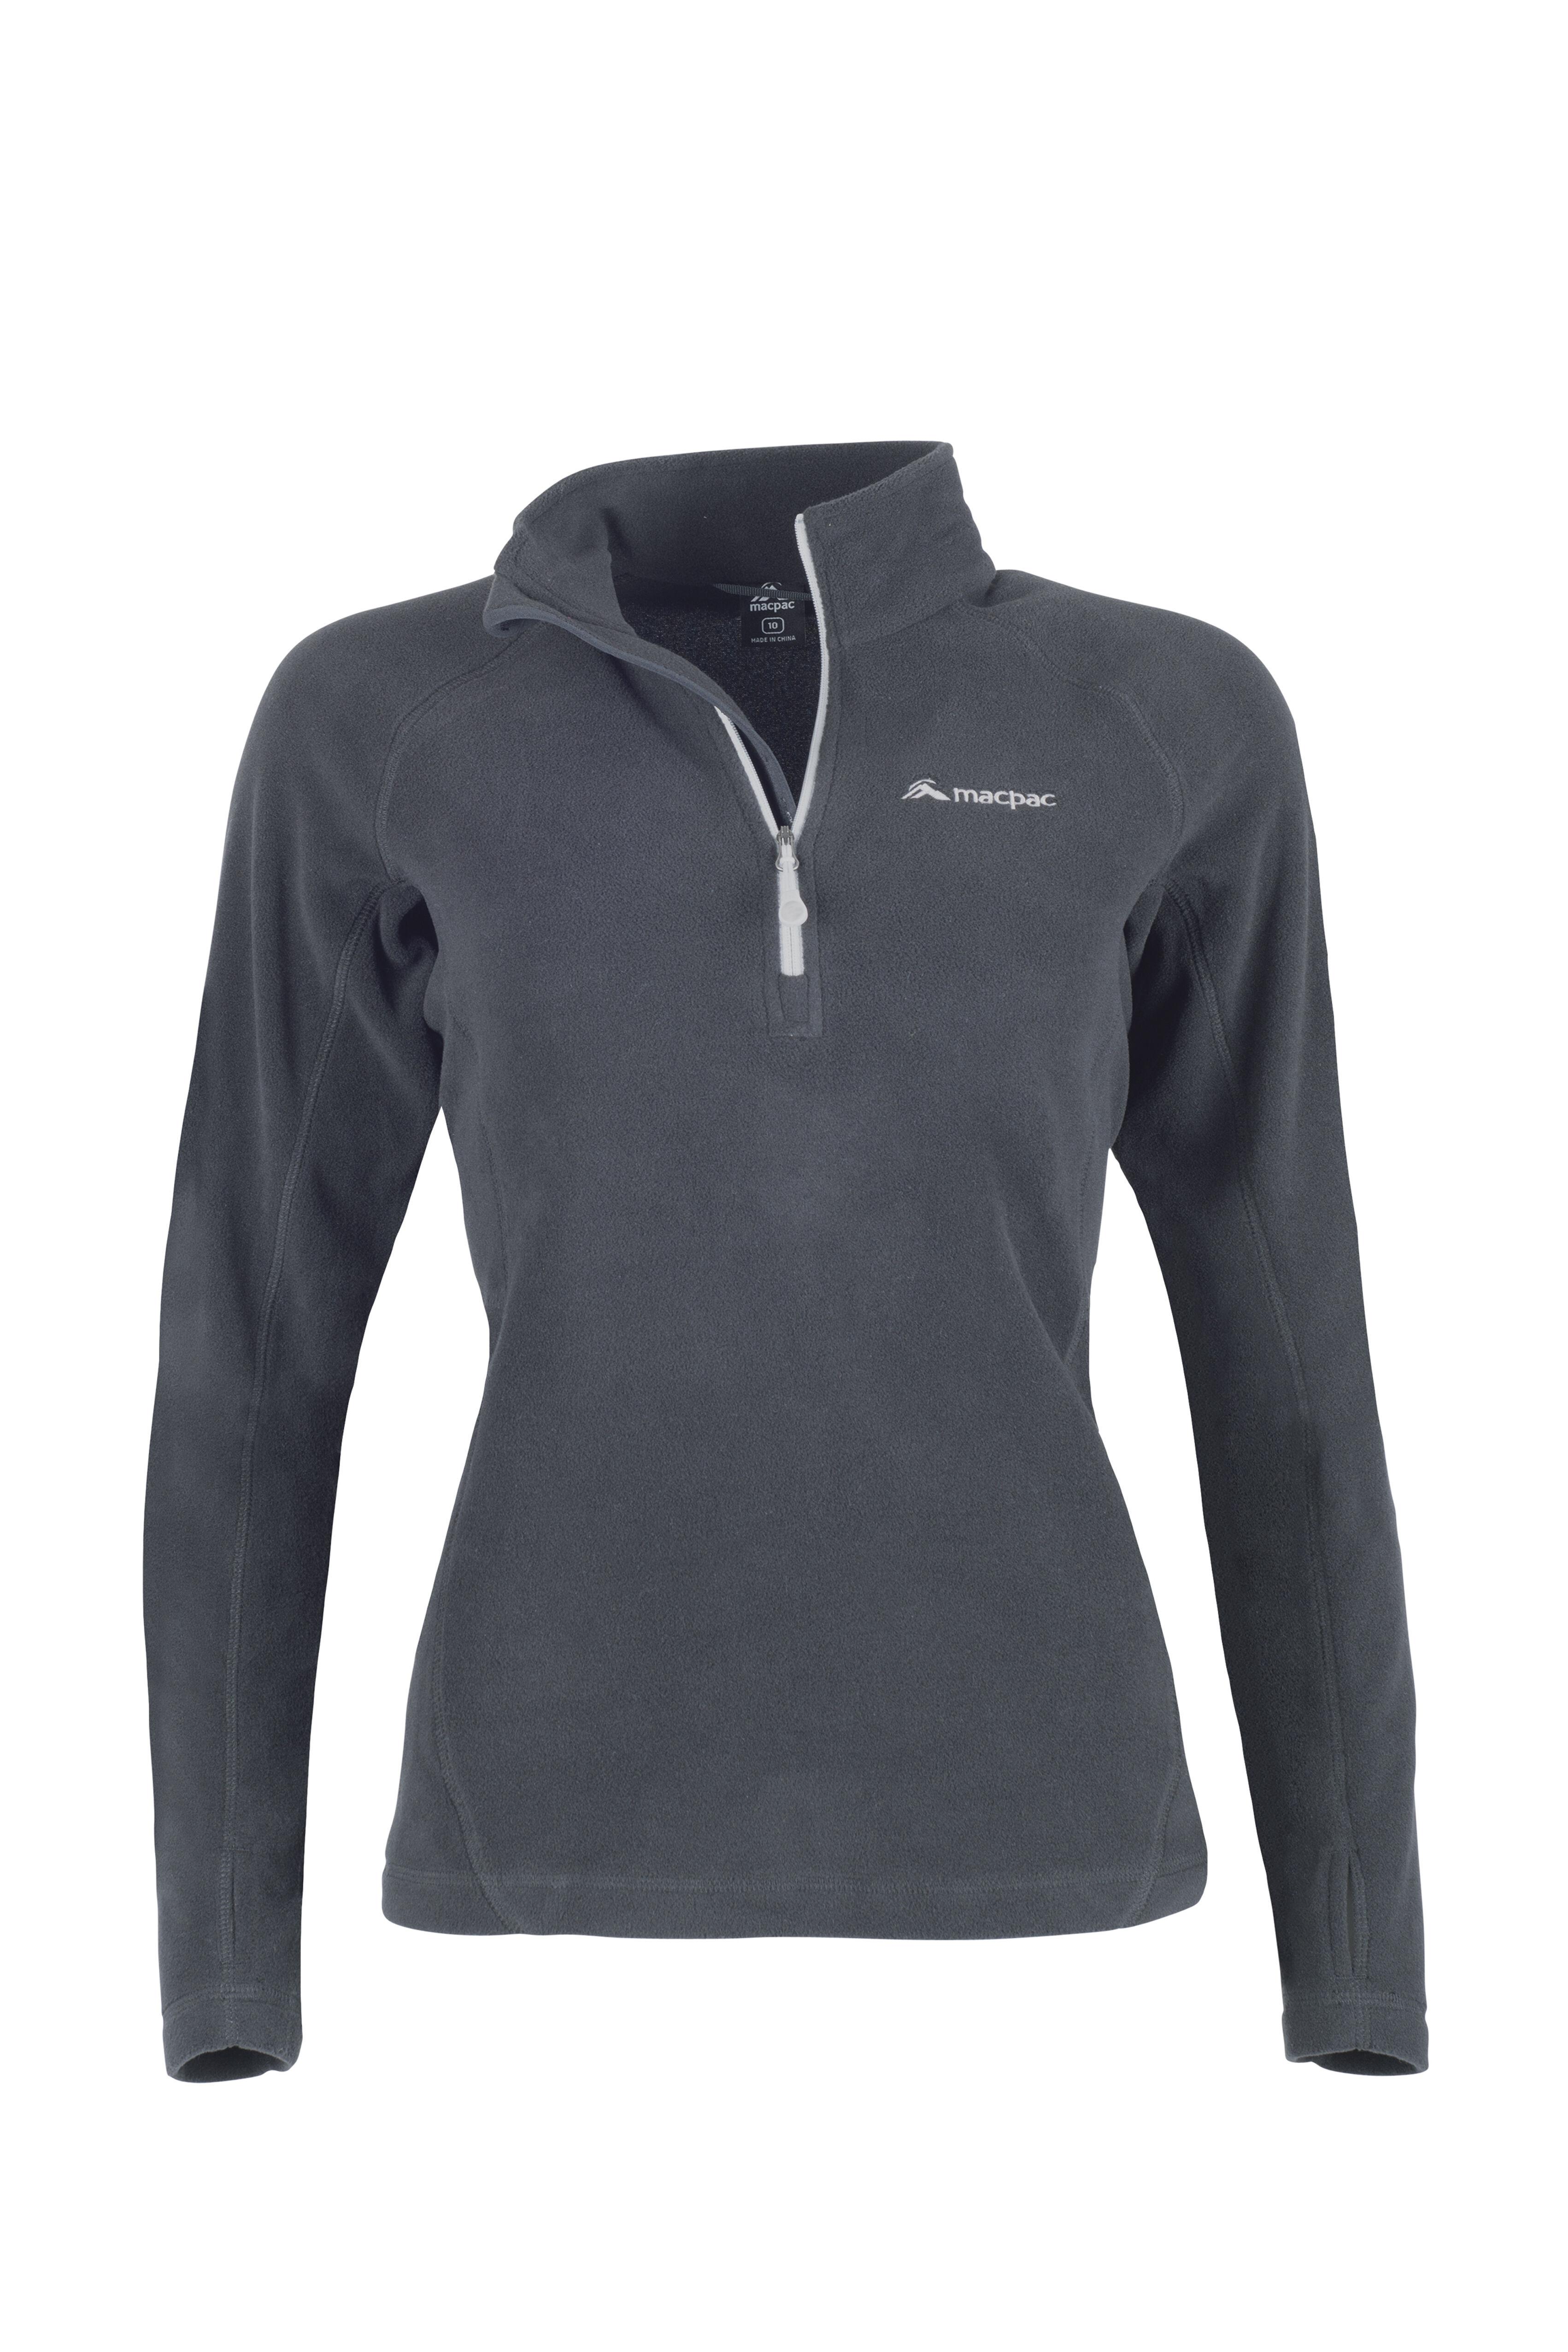 Macpac Tui Polartec® Micro Fleece® Pullover — Women's | Macpac